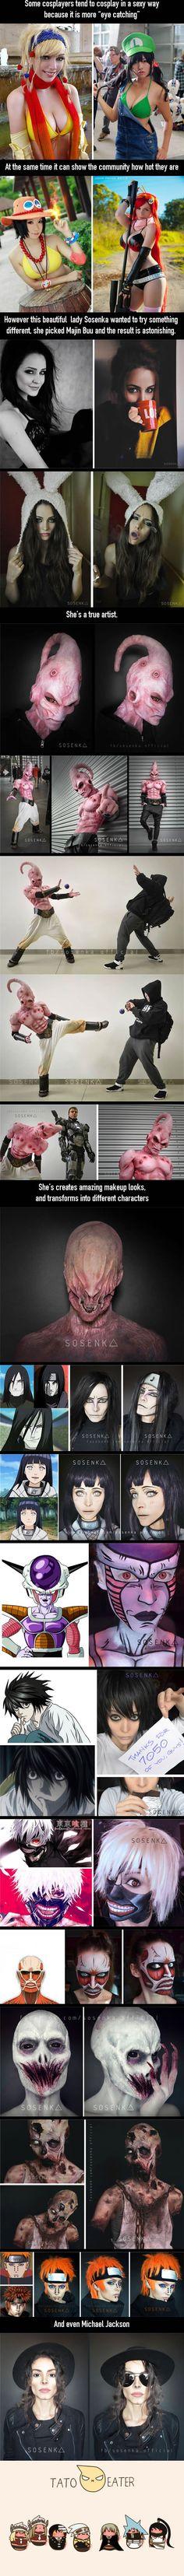 Make up Artist Sosenka Does an Amazing Majin Buu Cosplay.